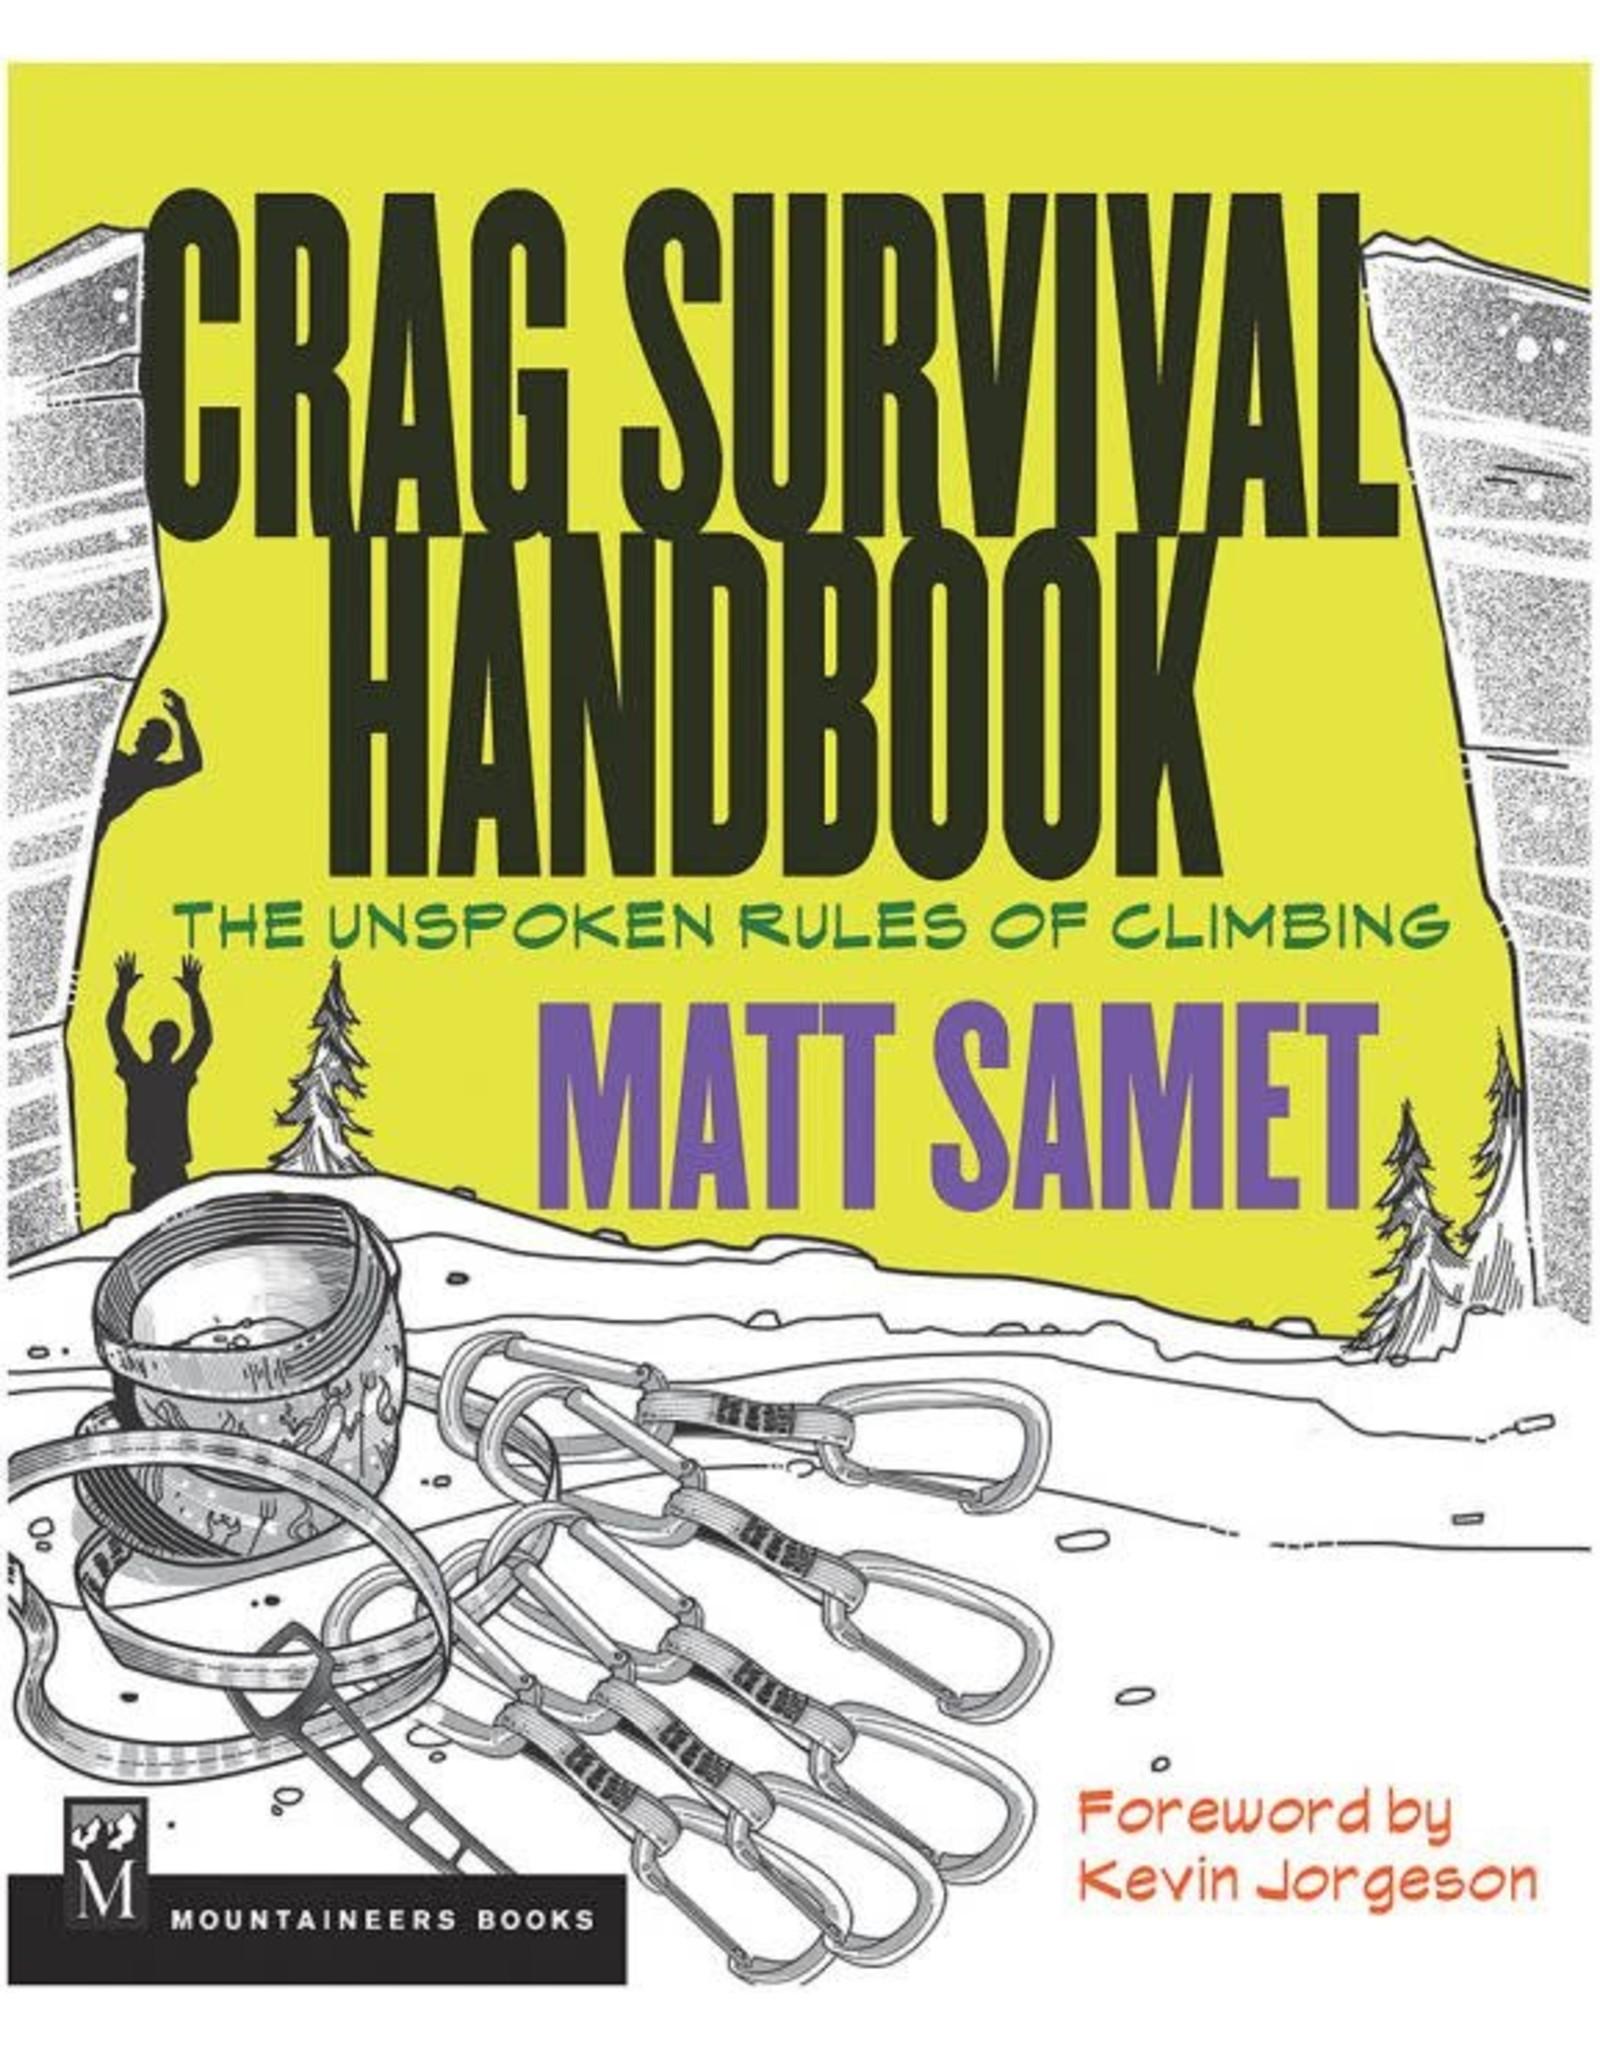 Mountaineers Books Crag Survival Handbook: The Unspoken Rules of Climbing by Matt Samet